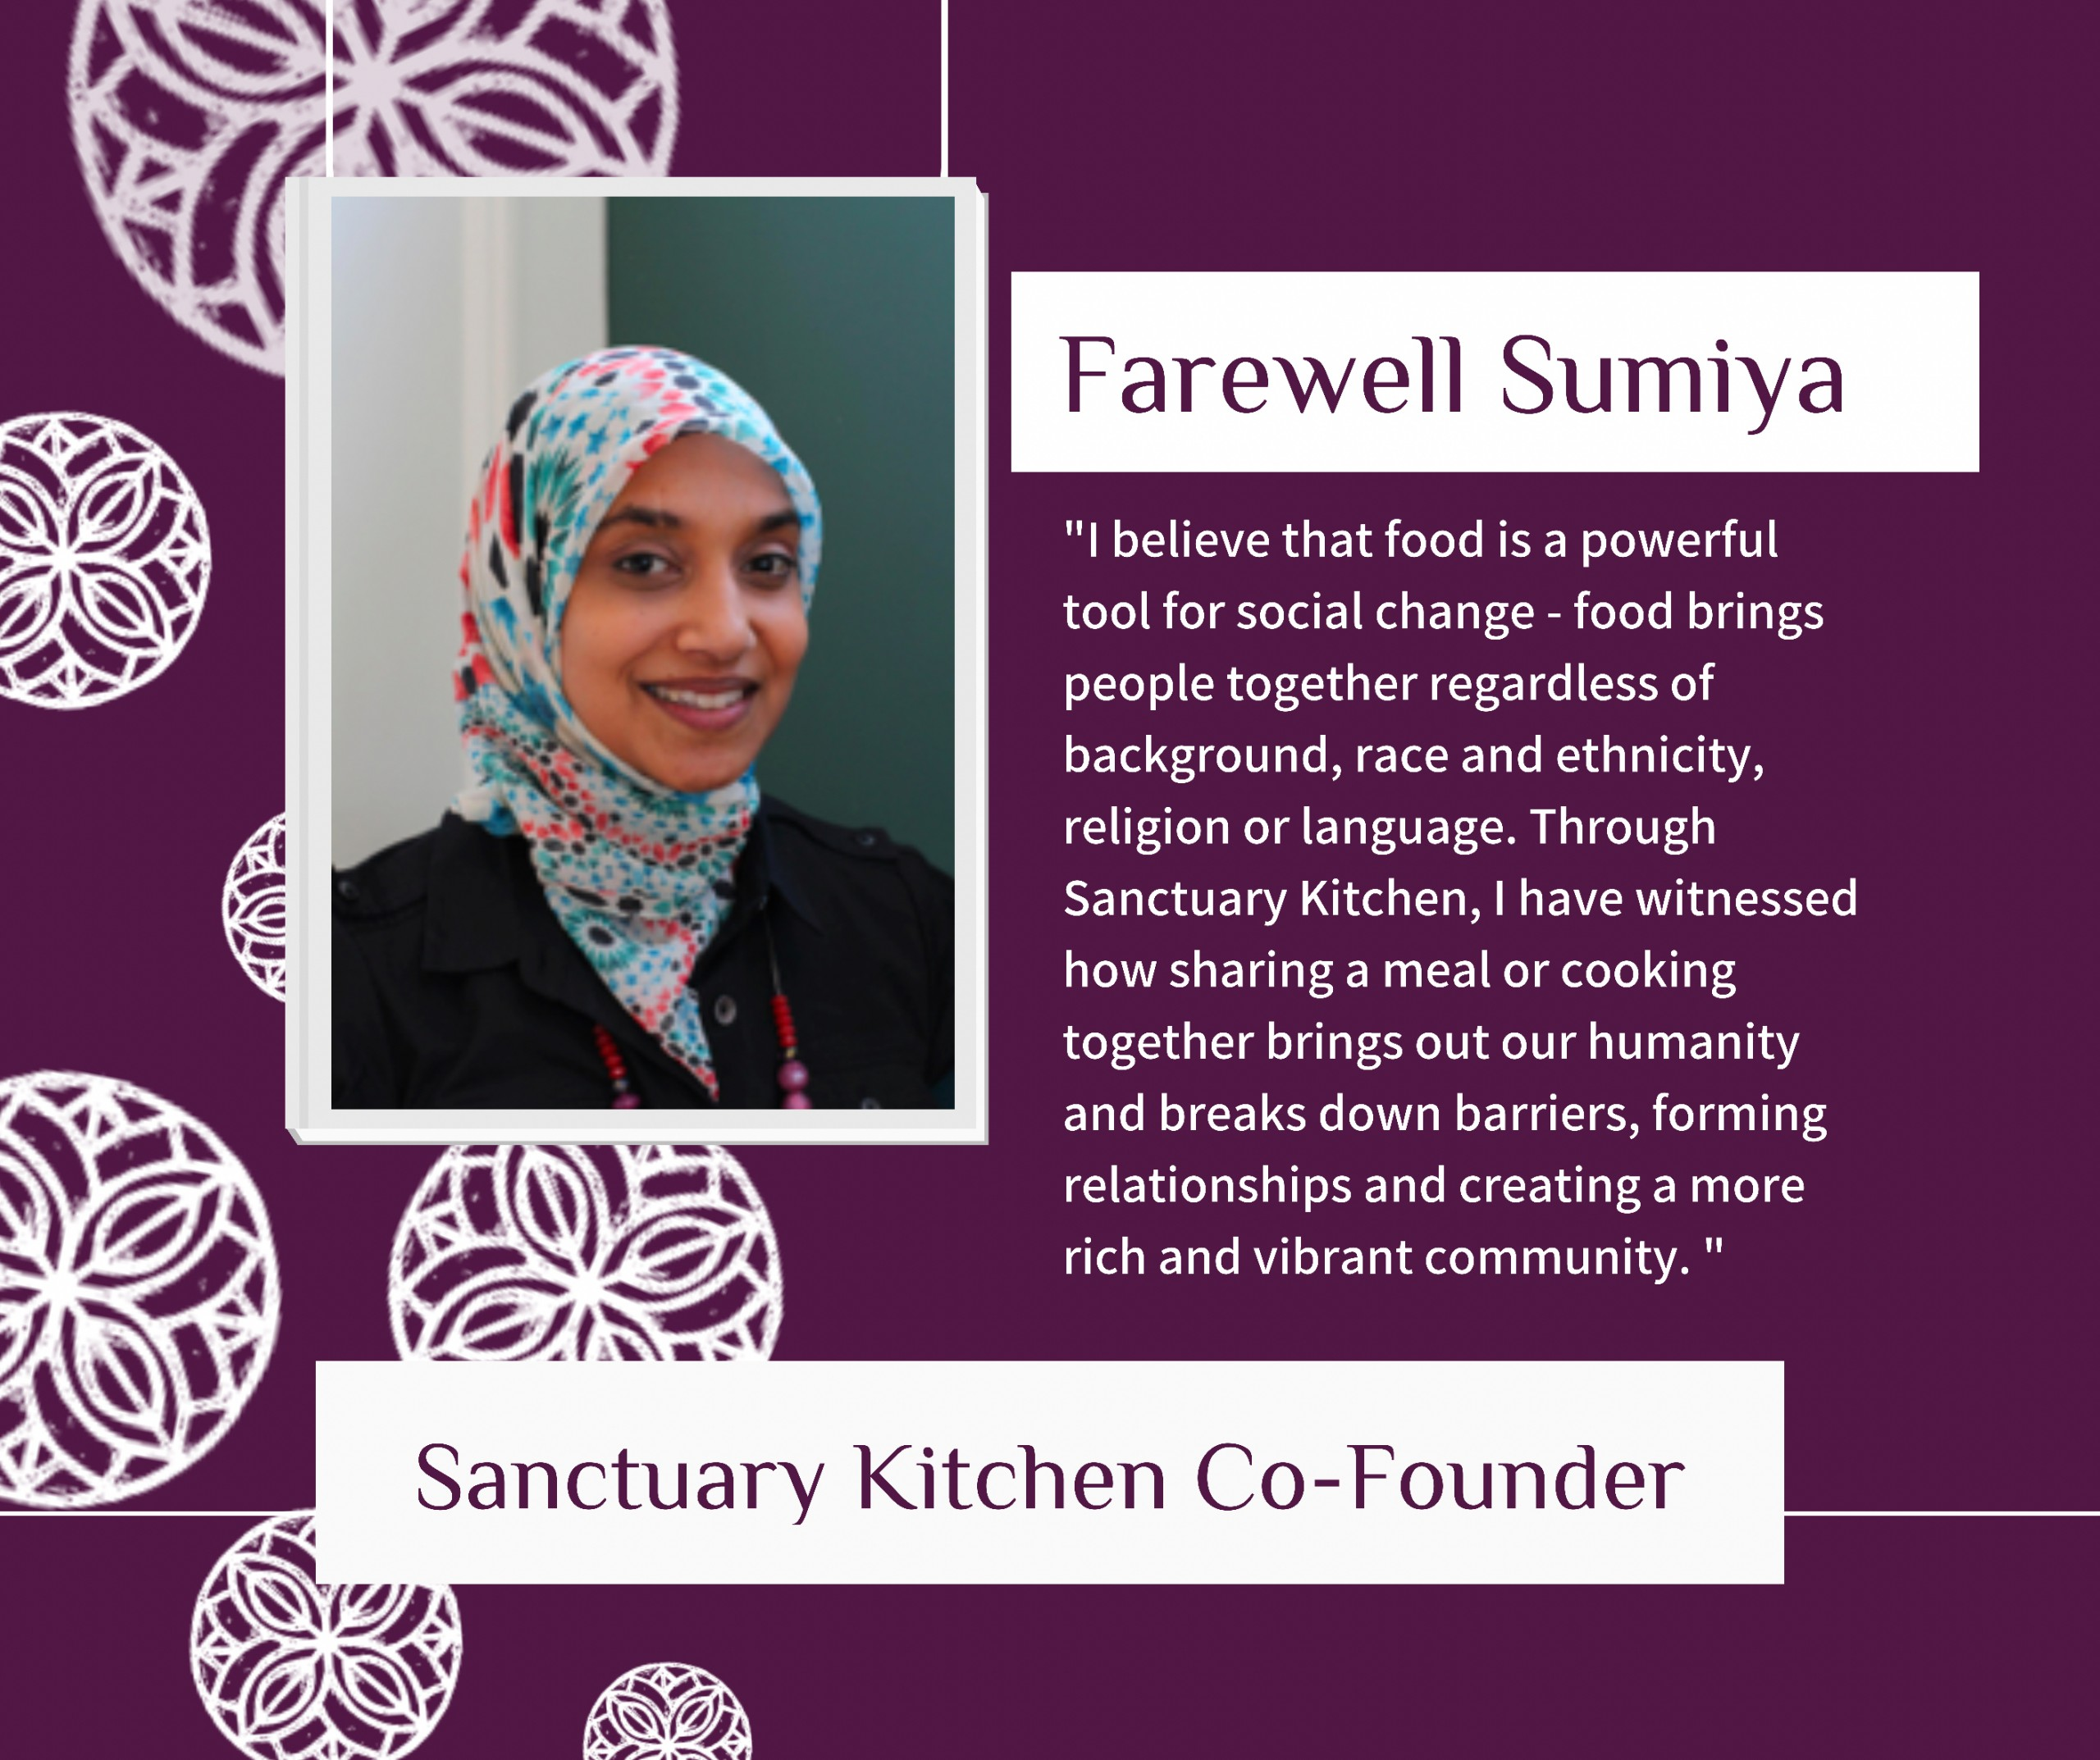 Farewell Sumiya!